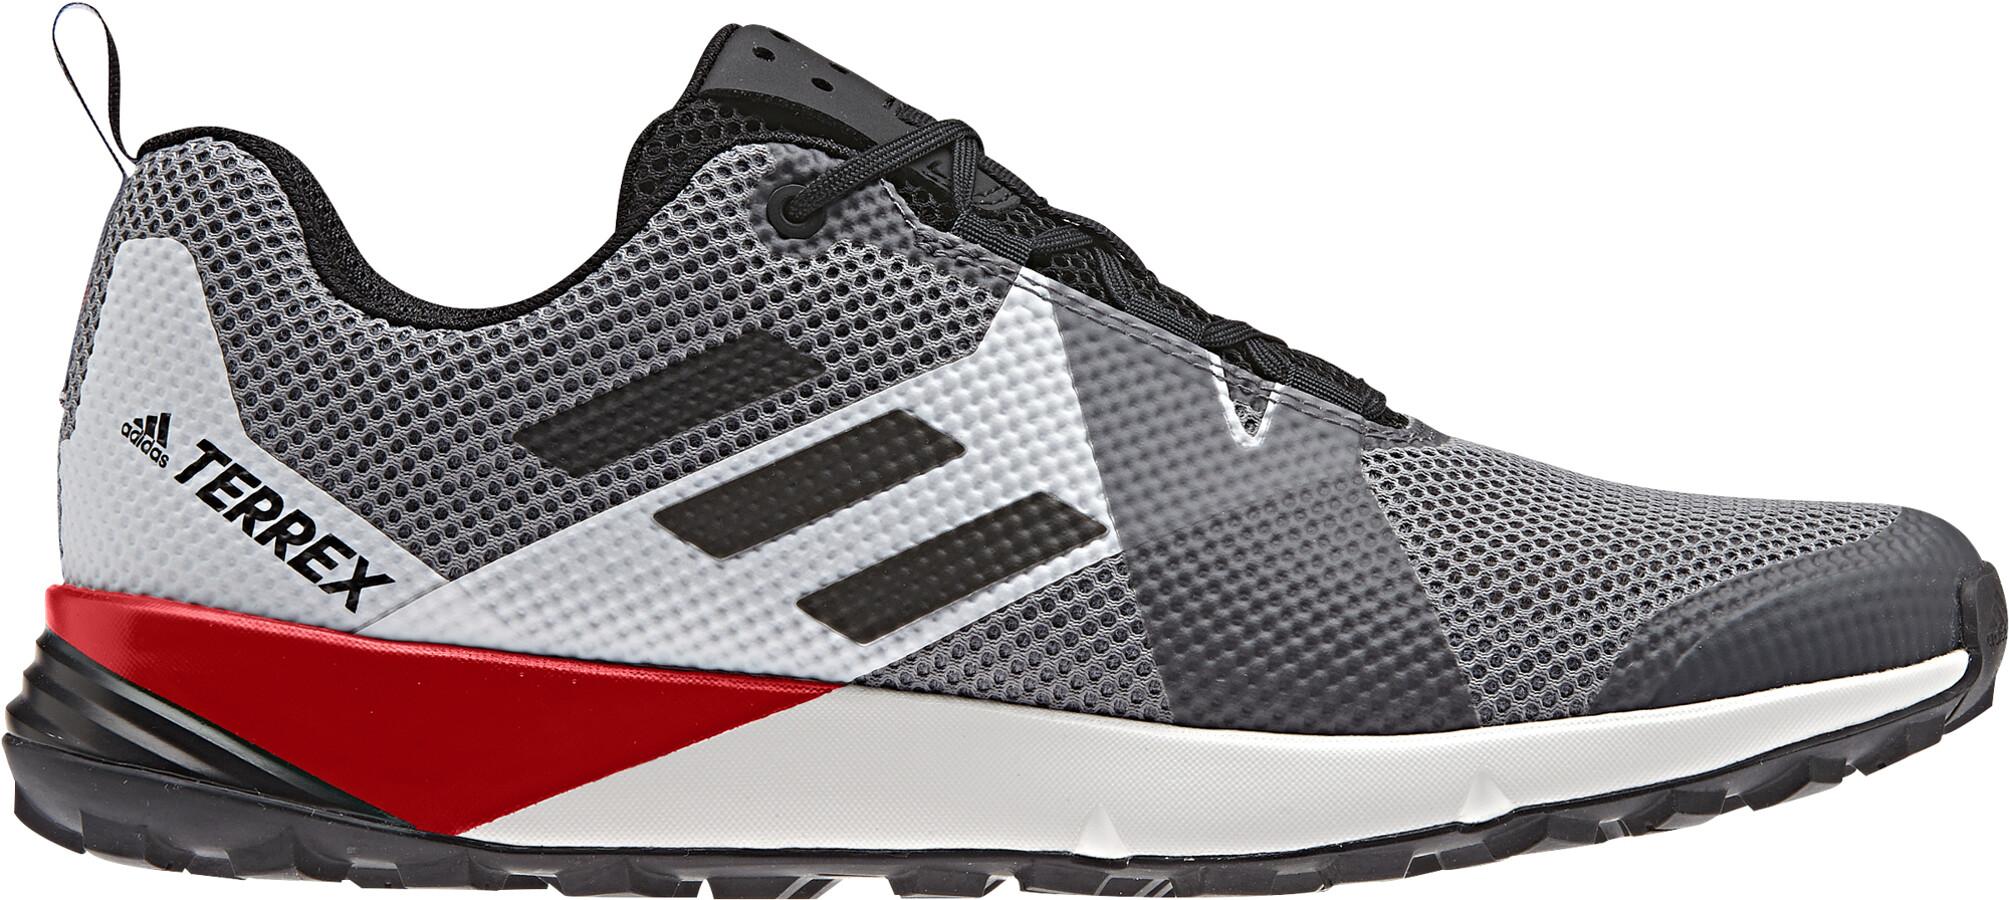 get cheap 3103e 6669c adidas TERREX Two scarpe da corsa Uomo grigio bianco